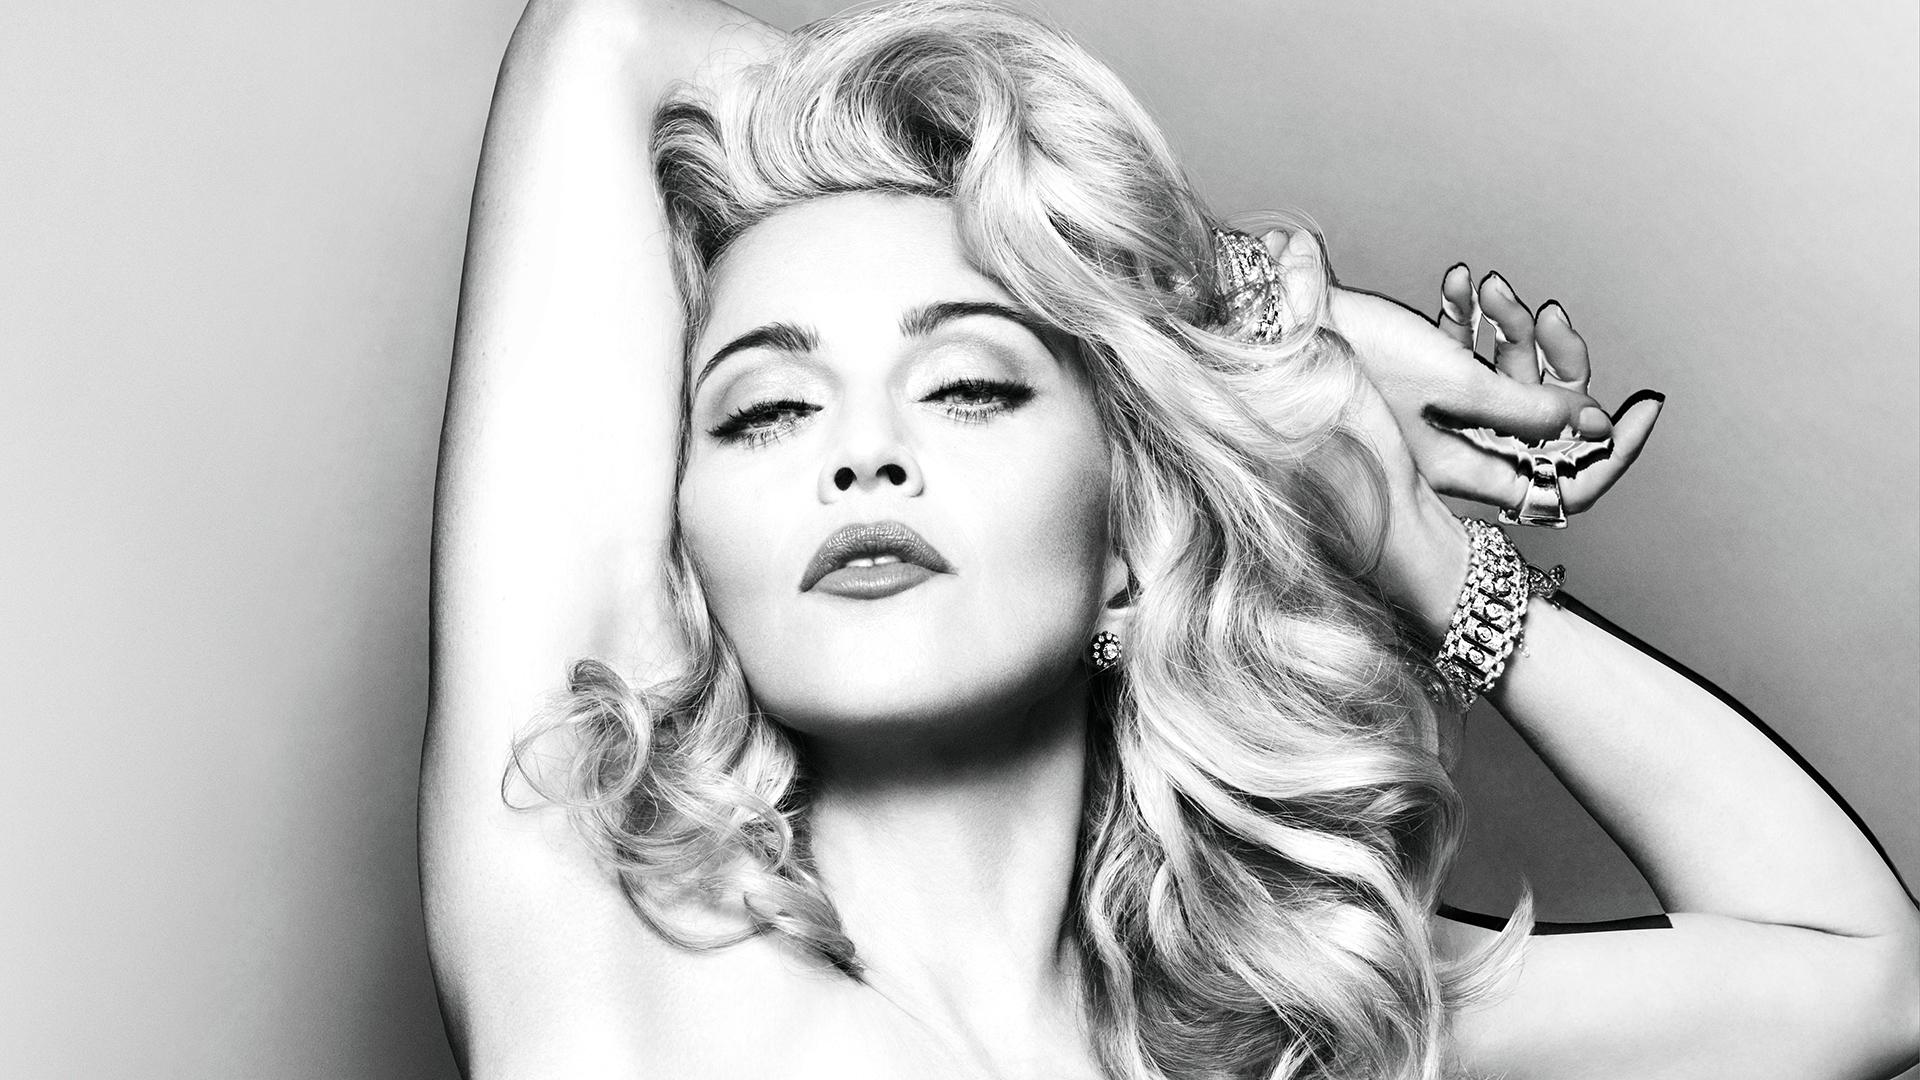 Madonna hd wallpaper background image 1920x1080 id 545501 wallpaper abyss - Madonna hd images ...